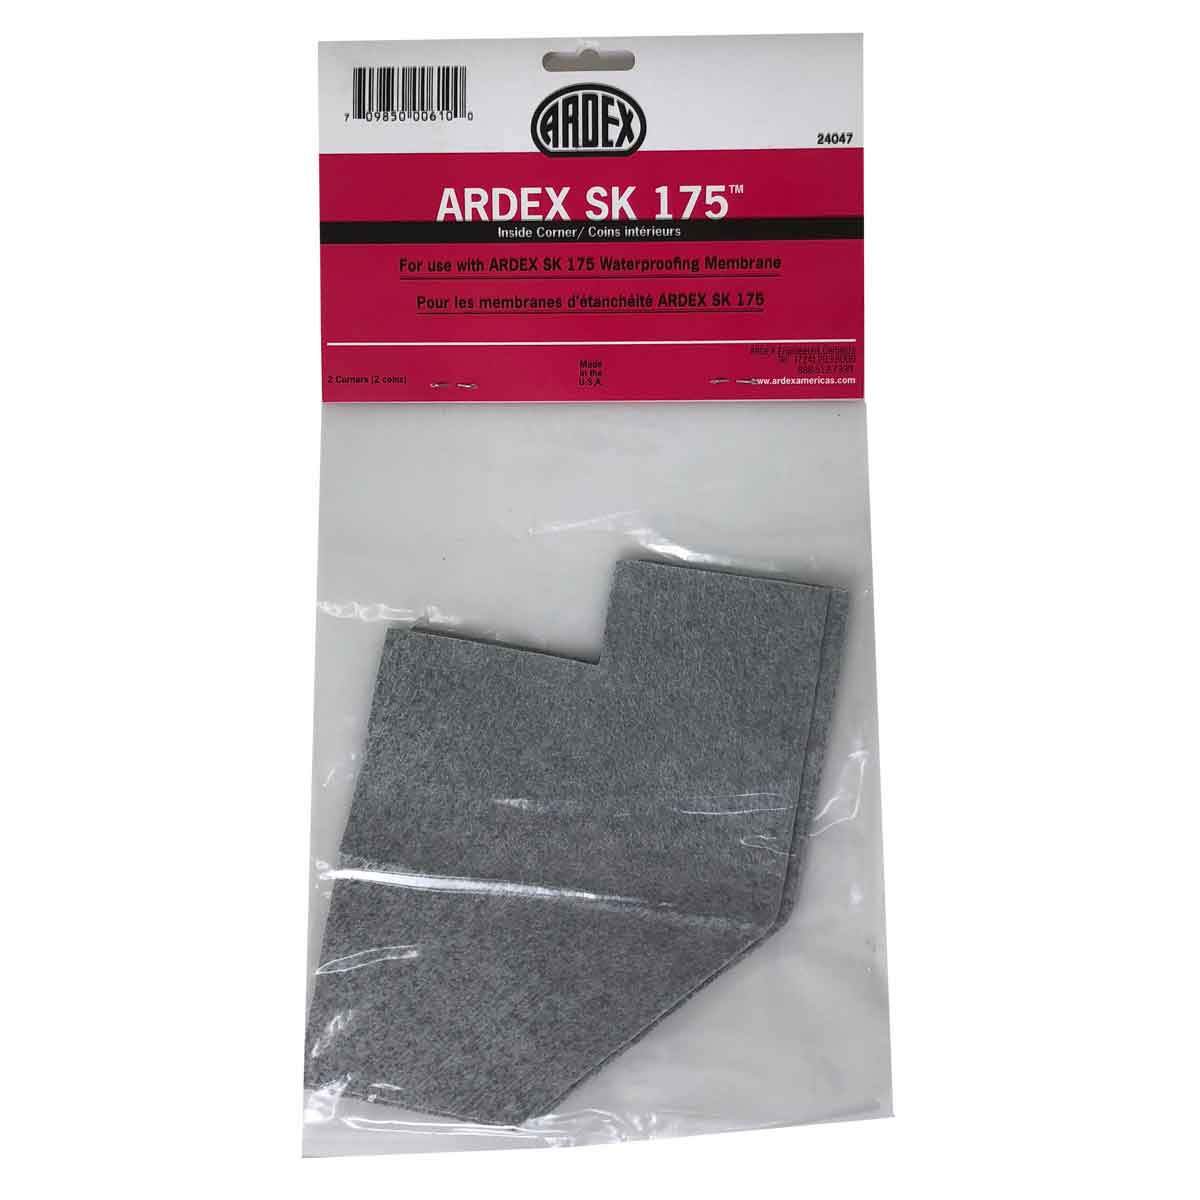 Ardex Waterproofing Inside Corner